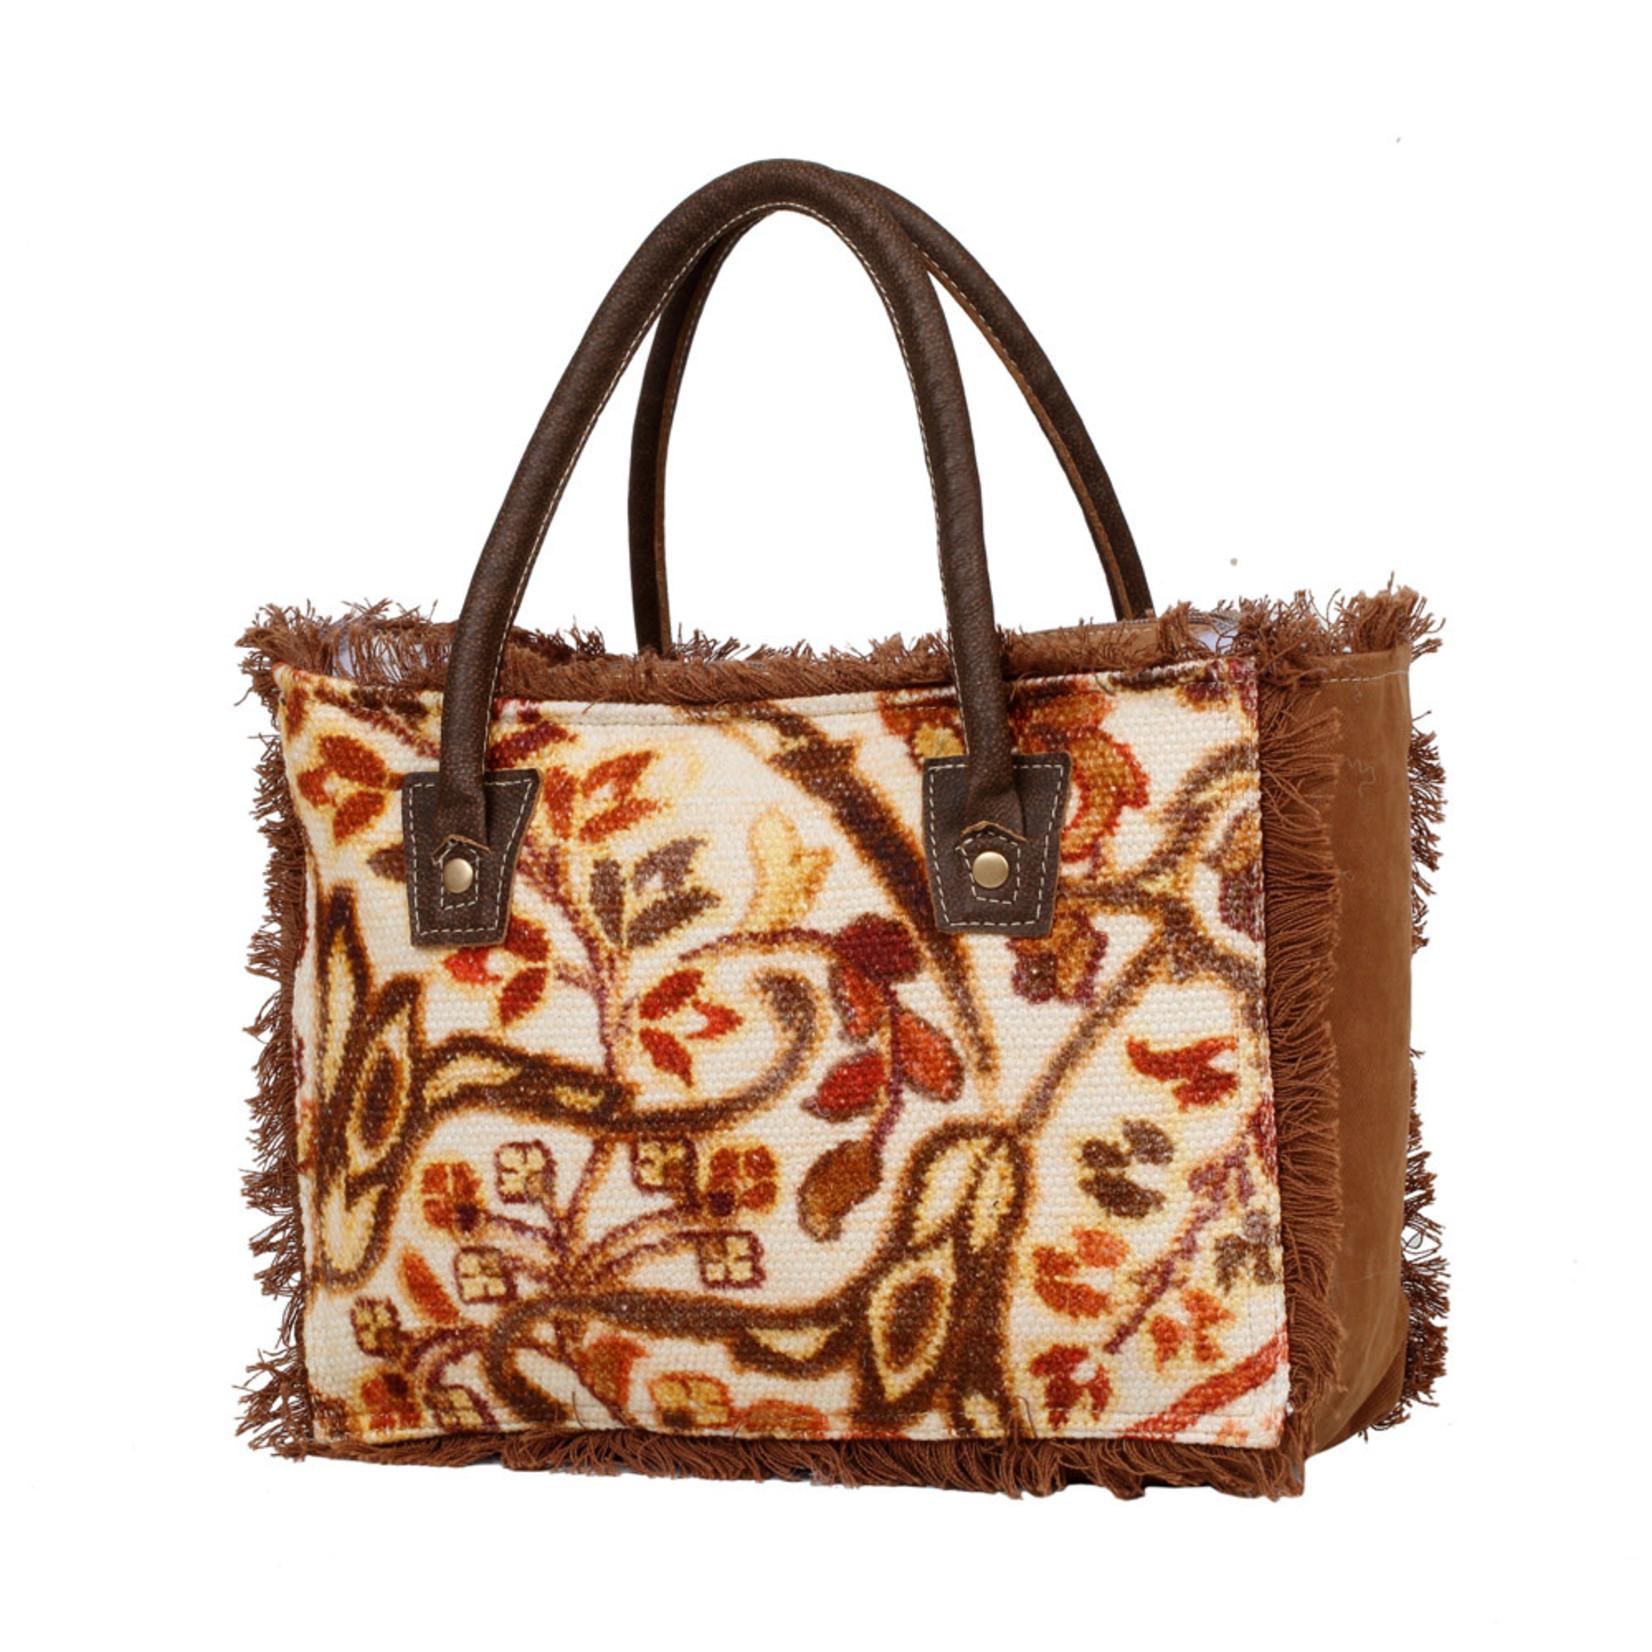 Myra Bags S-2533 Blazing Fire Small Bag